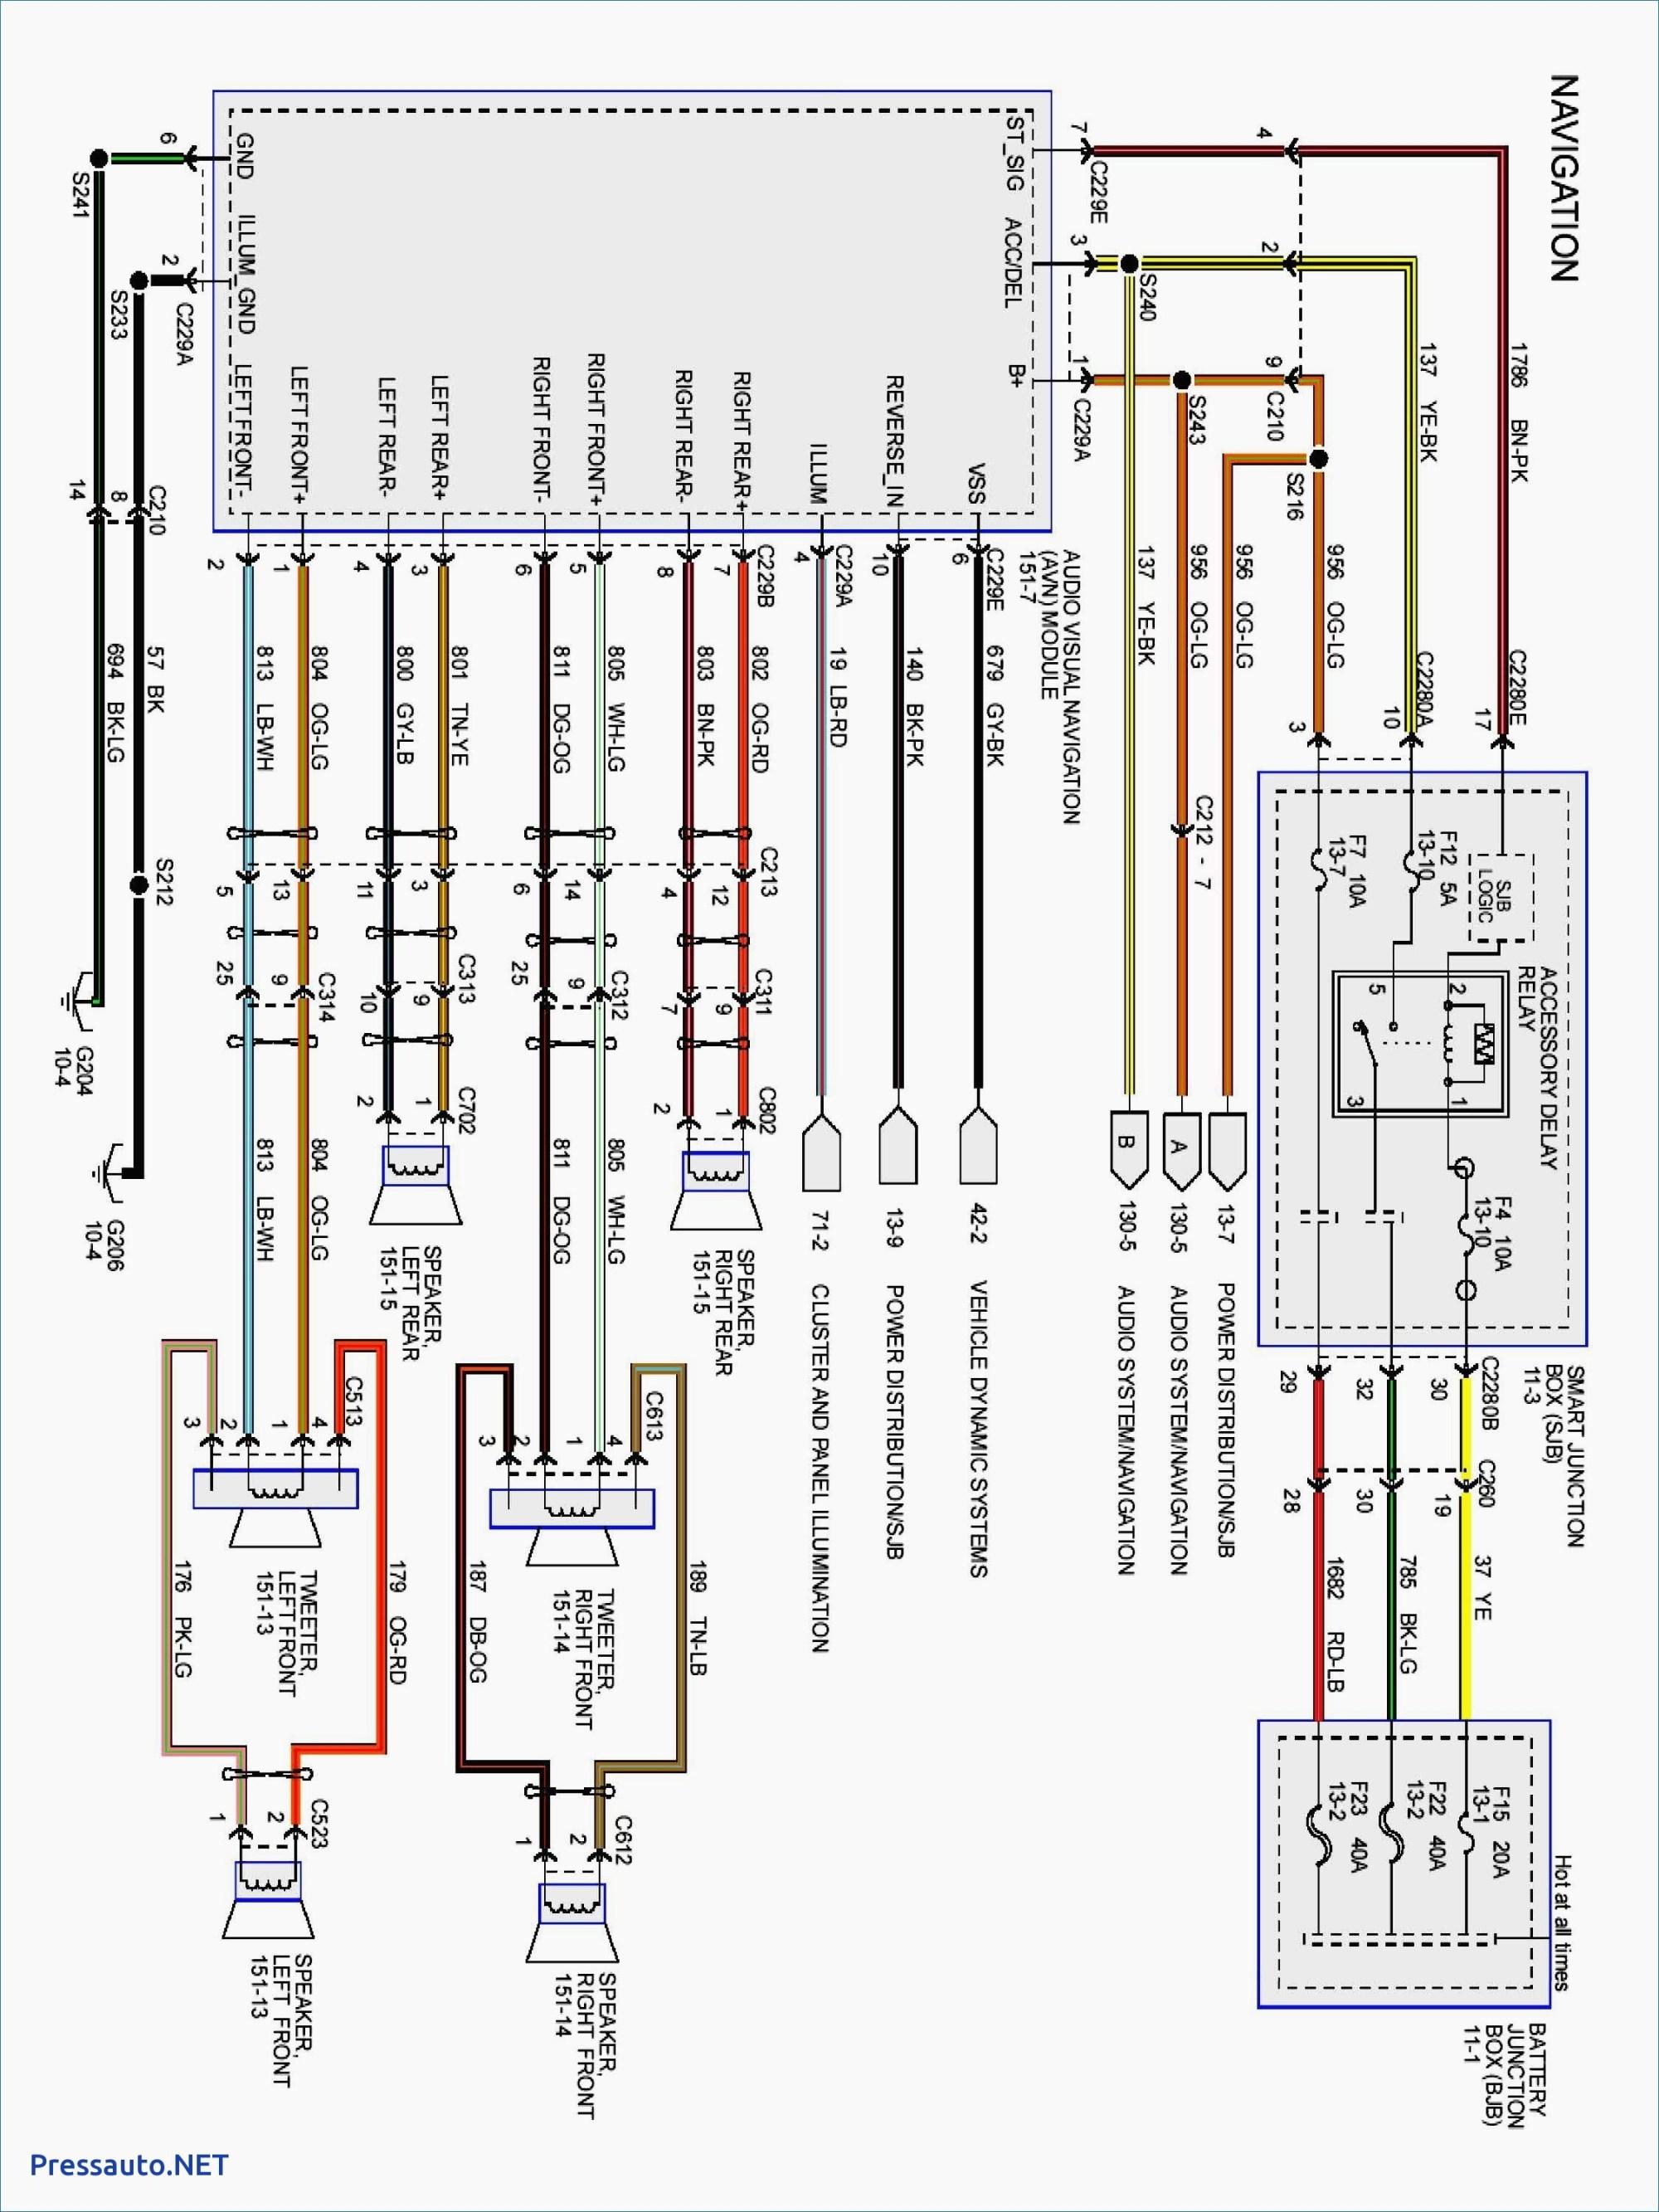 hight resolution of 2011 ford f150 radio wiring diagram 2017 toyota corolla radio wiring rh detoxicrecenze com